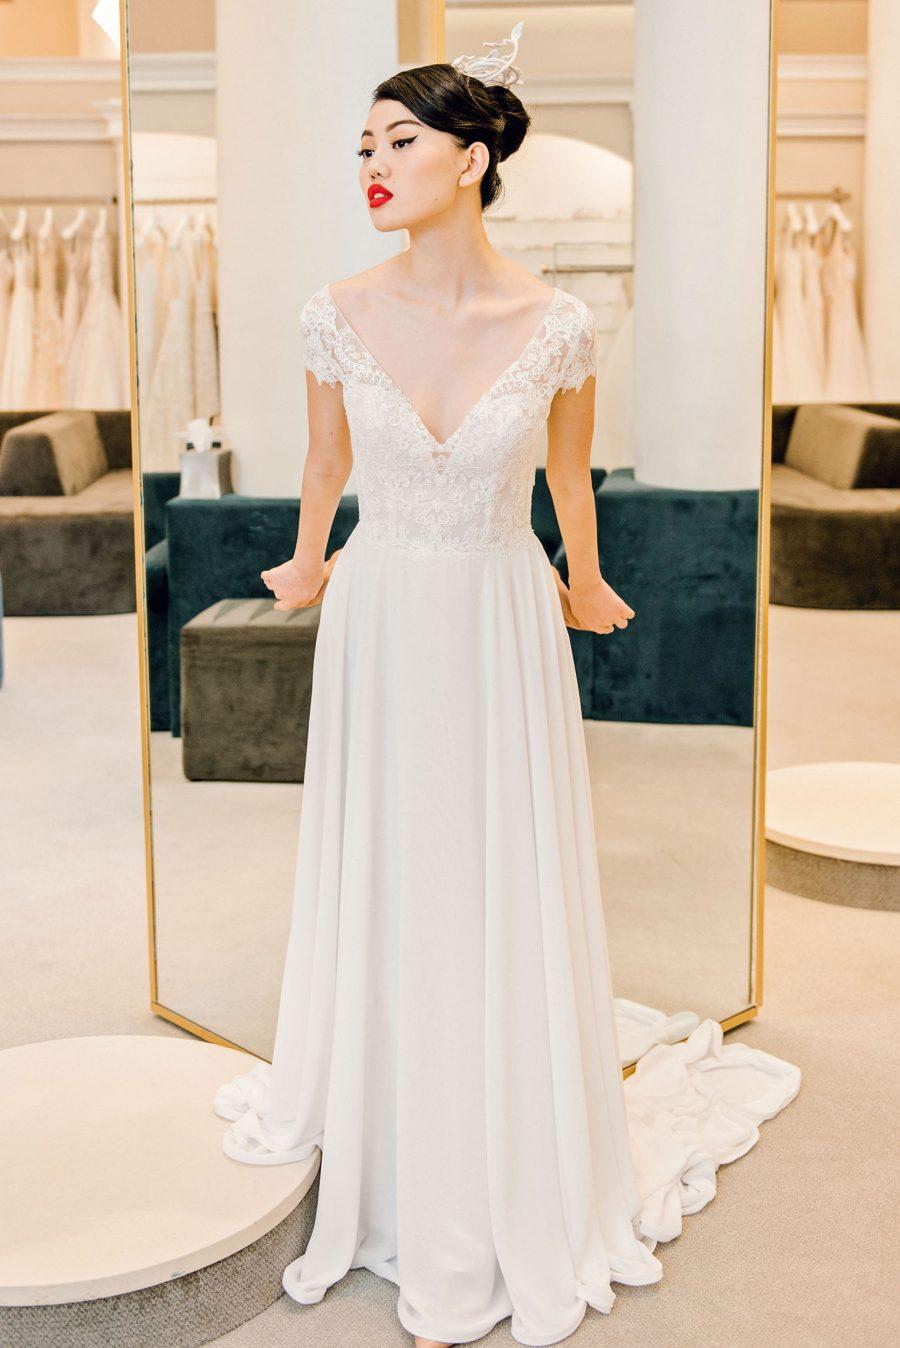 Lace Cap Sleeve Chiffon Skirt Wedding Dress Kleinfeld Bridal,Non Traditional Wedding Dress Colors